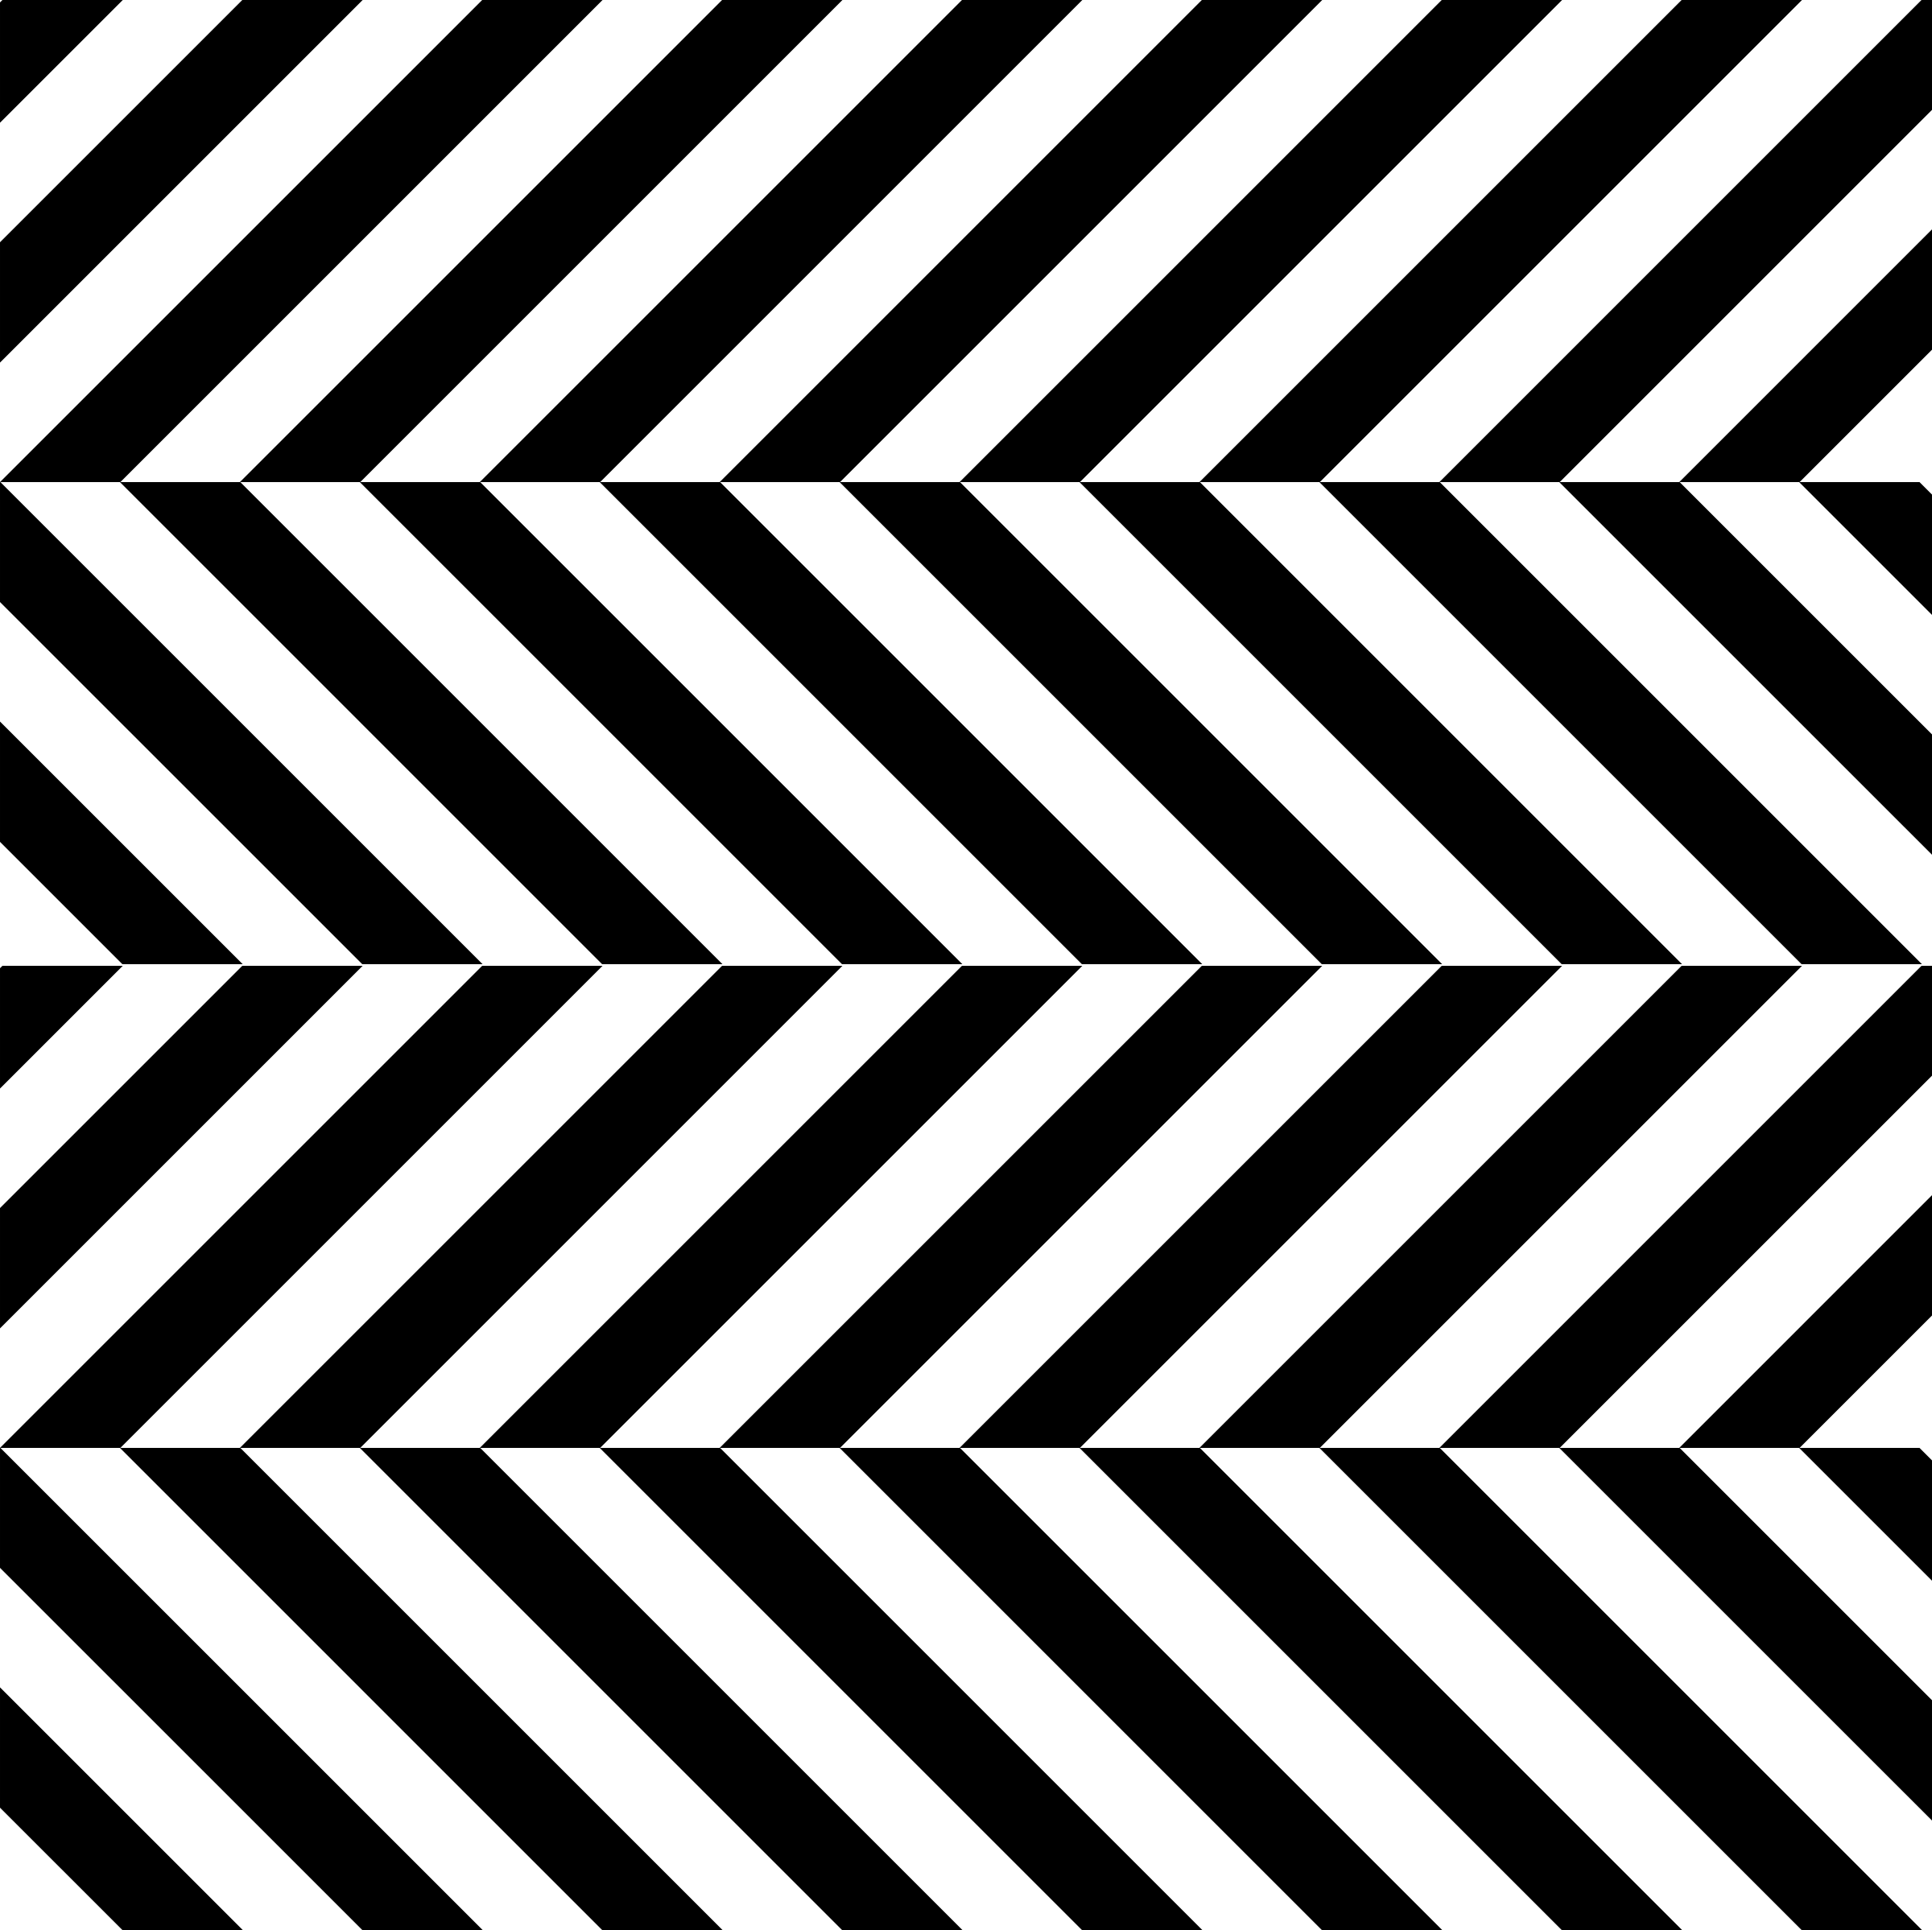 BlackWhiteAlternatingDiagonalStripes.png (2400×2398